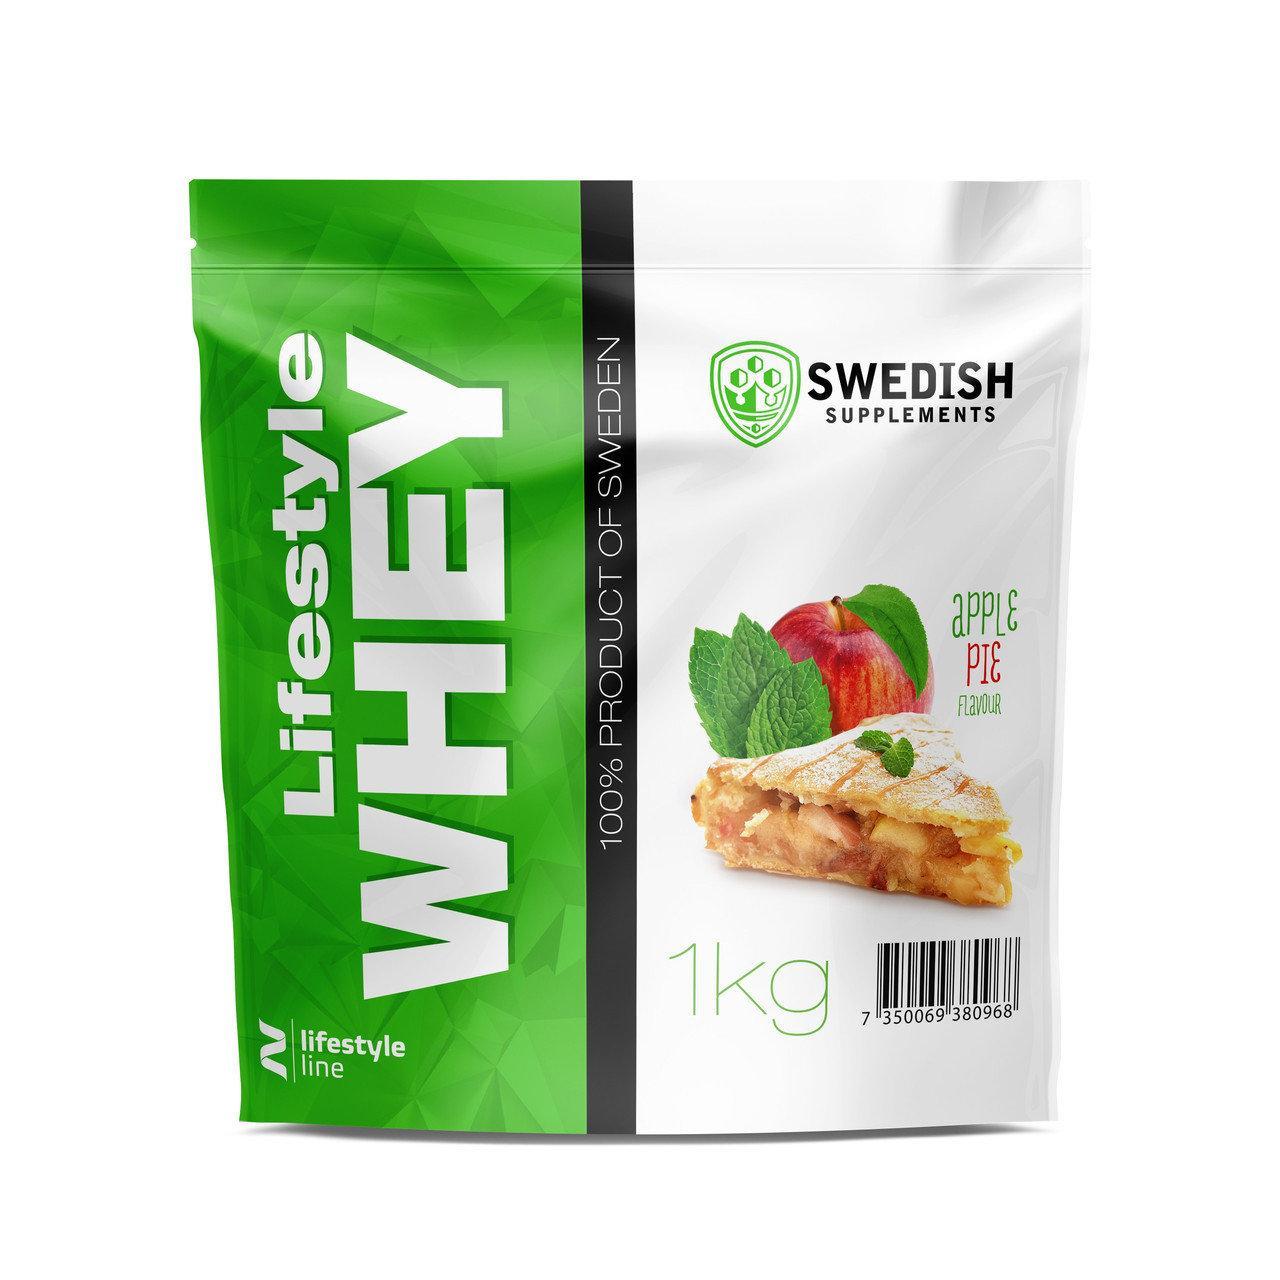 Сывороточный протеин Swedish LifeStyle Whey 1 kg